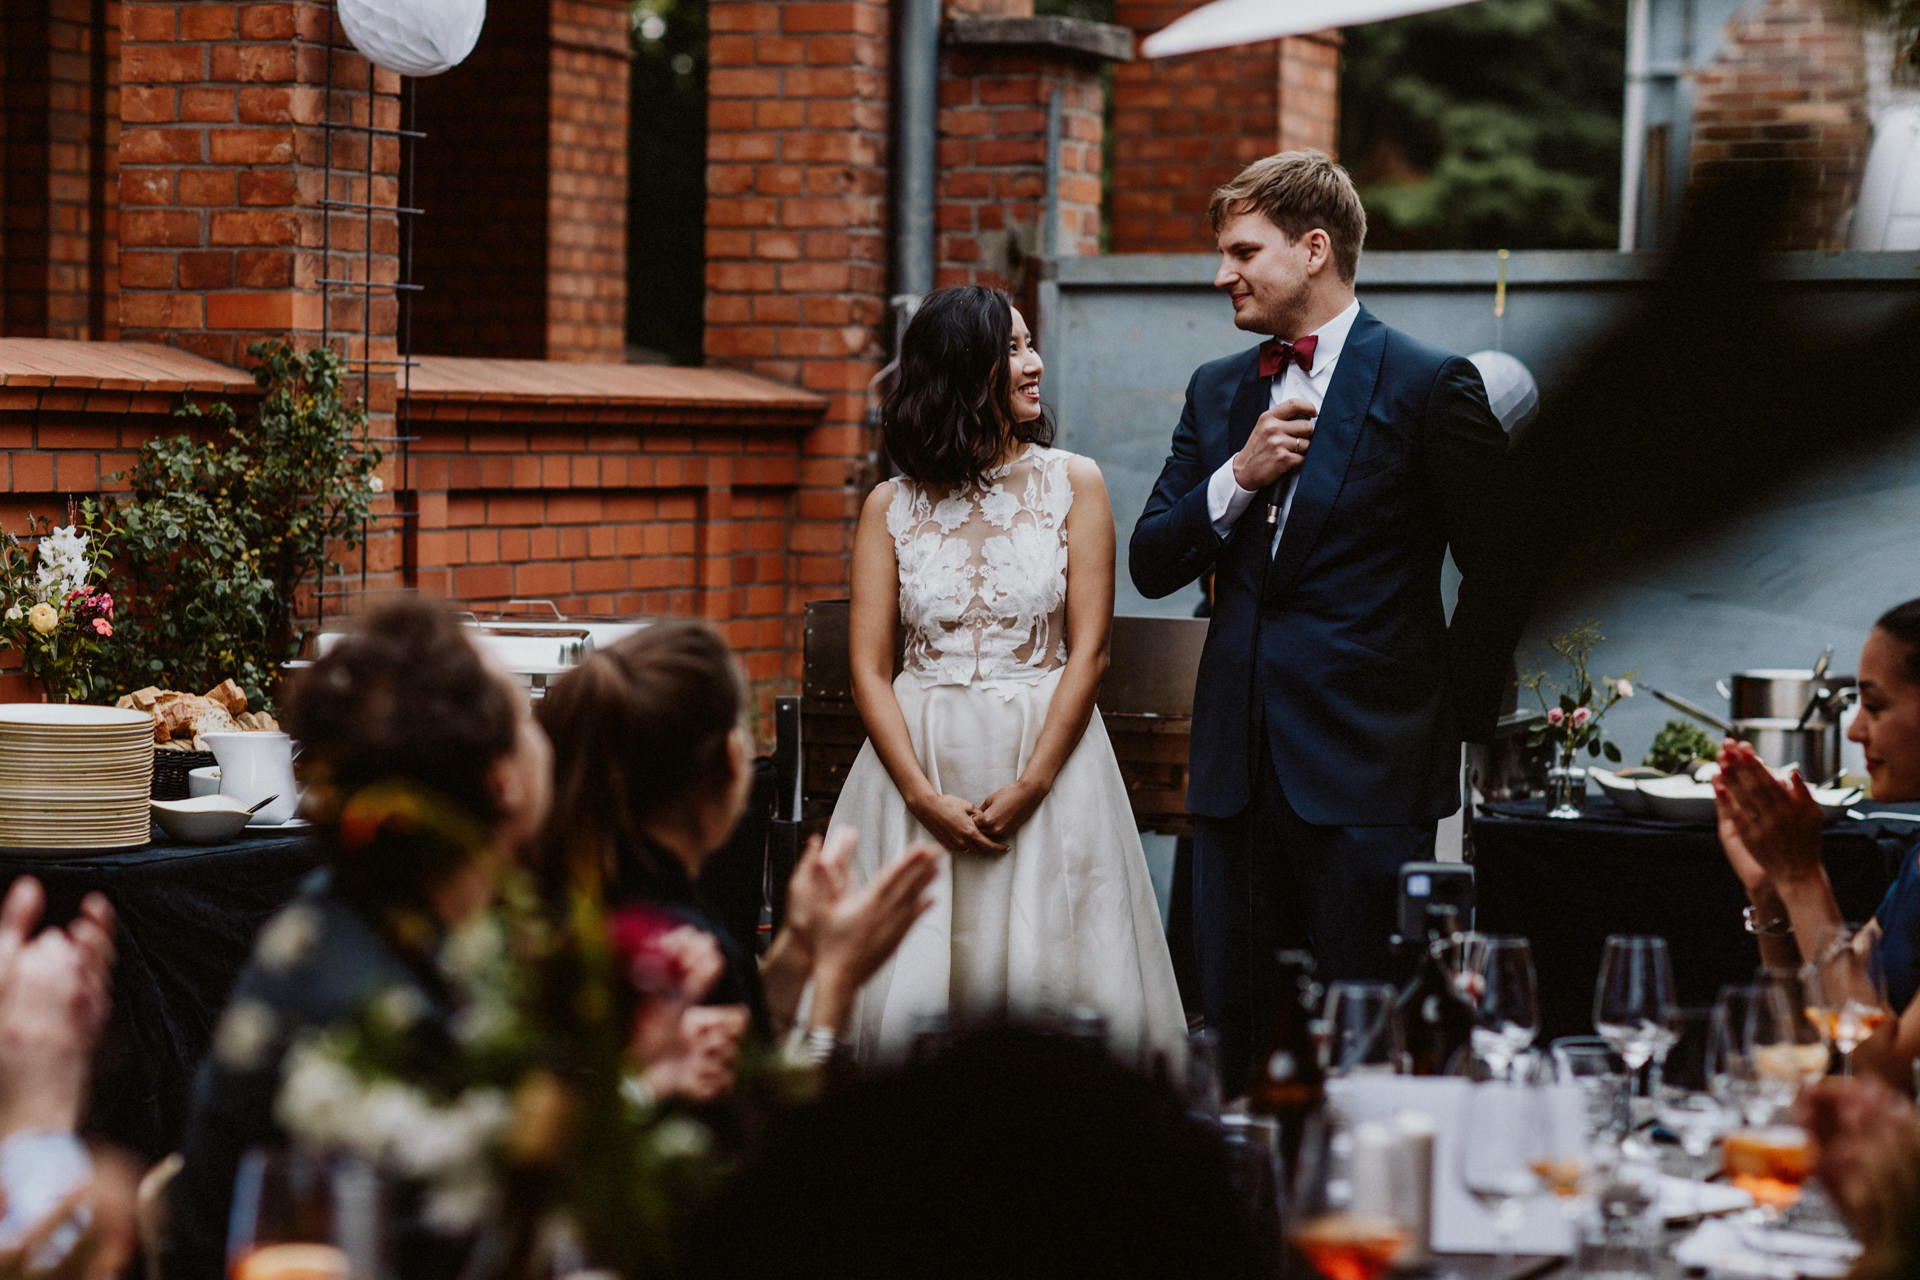 hochzeit 21 gramm berlin neukölln heiraten